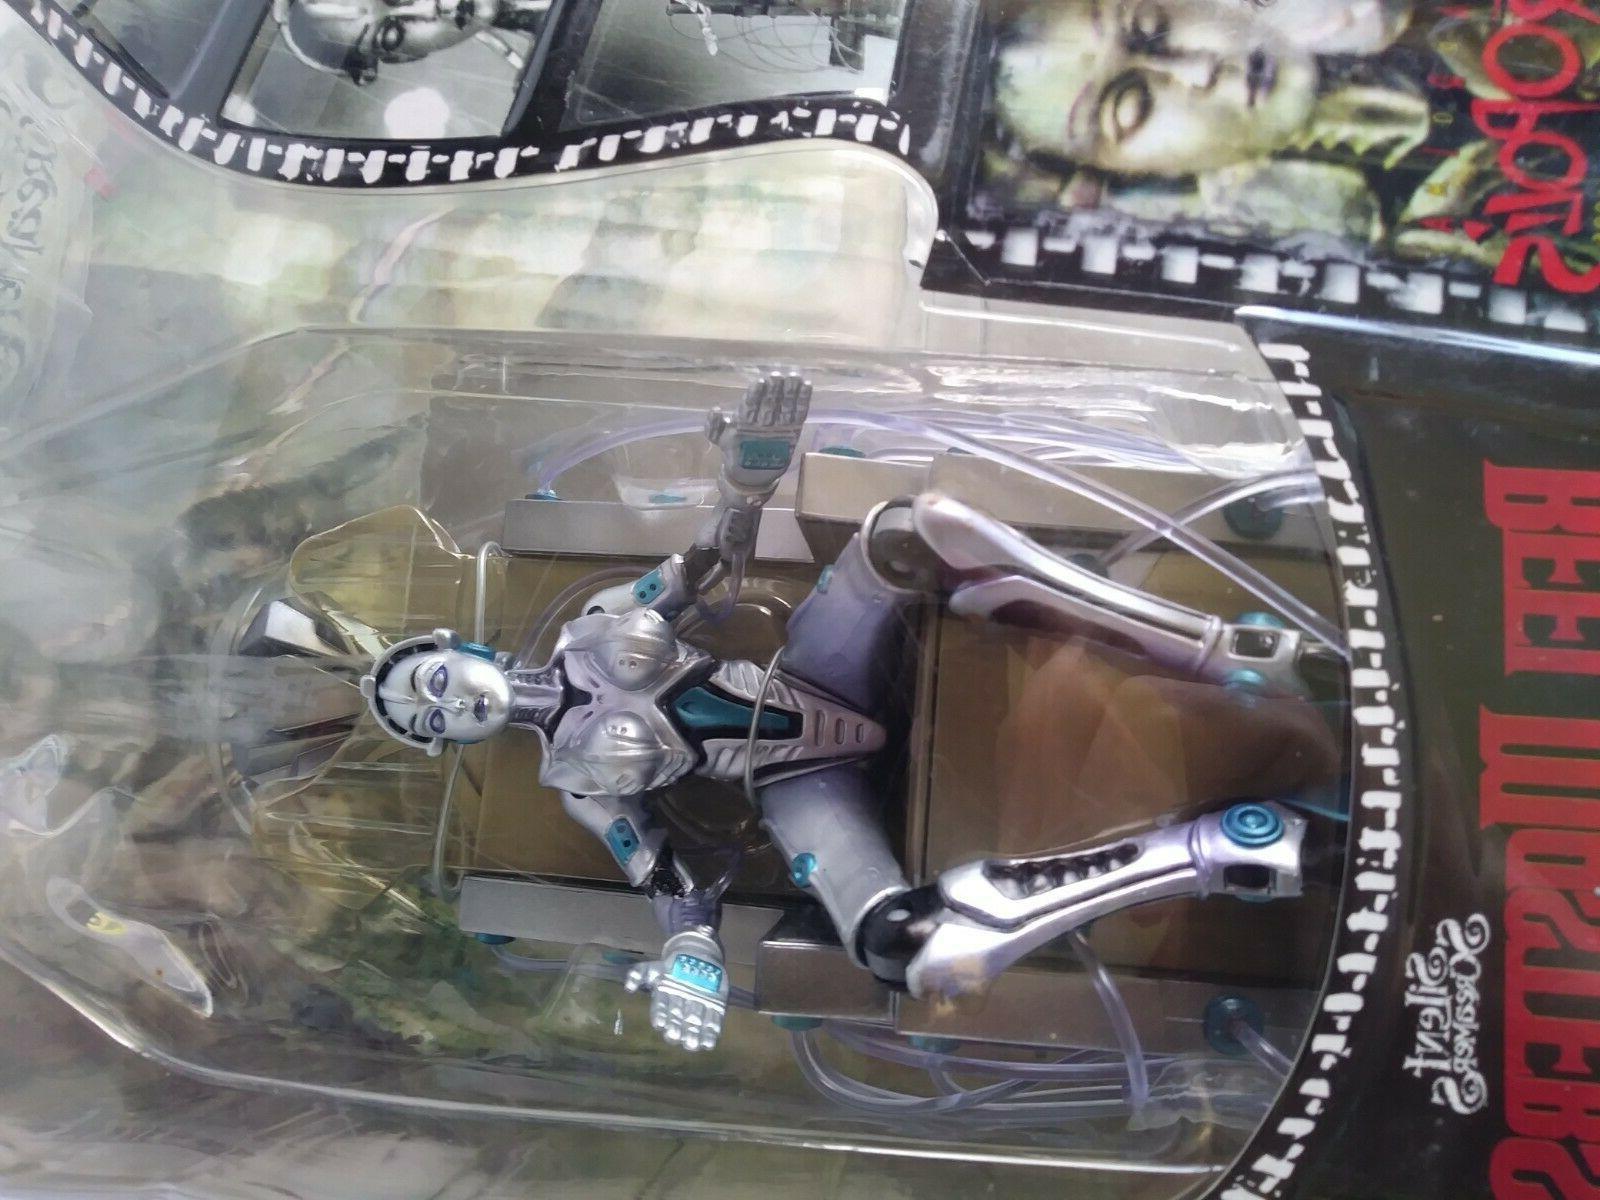 "METROPOLIS 7"" Horror/Sci-Fi Action Figure NEW!"